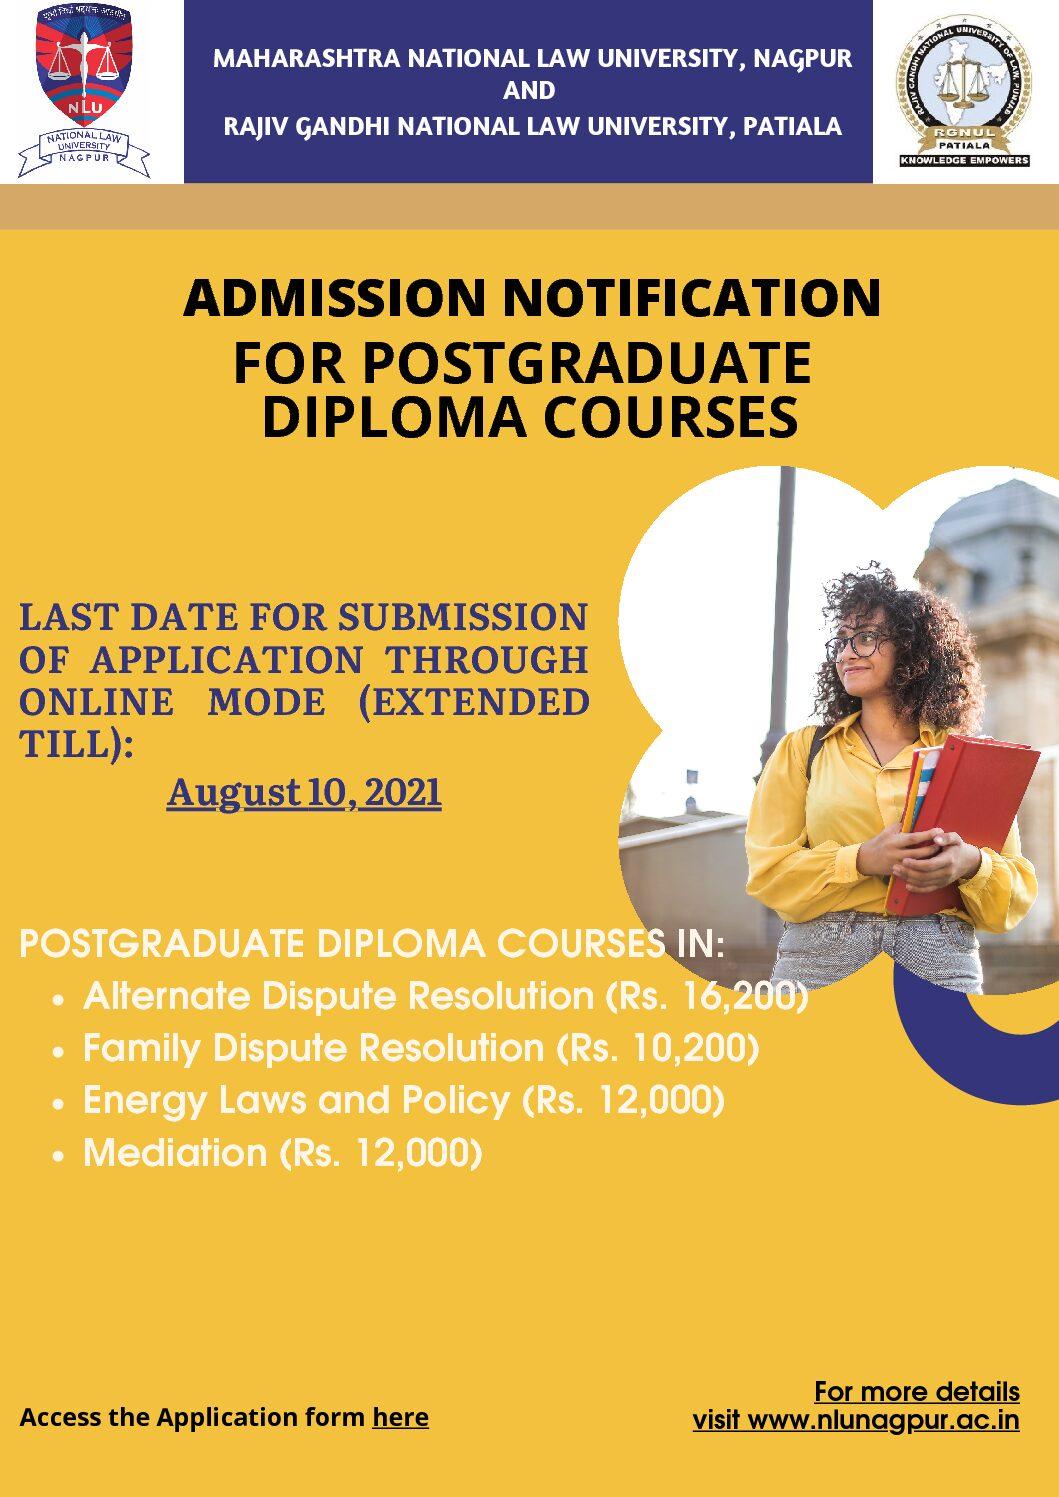 ADMISSION NOTIFICATION FOR POSTGRADUATE DIPLOMA COURSES: Maharashtra National Law University, Nagpur